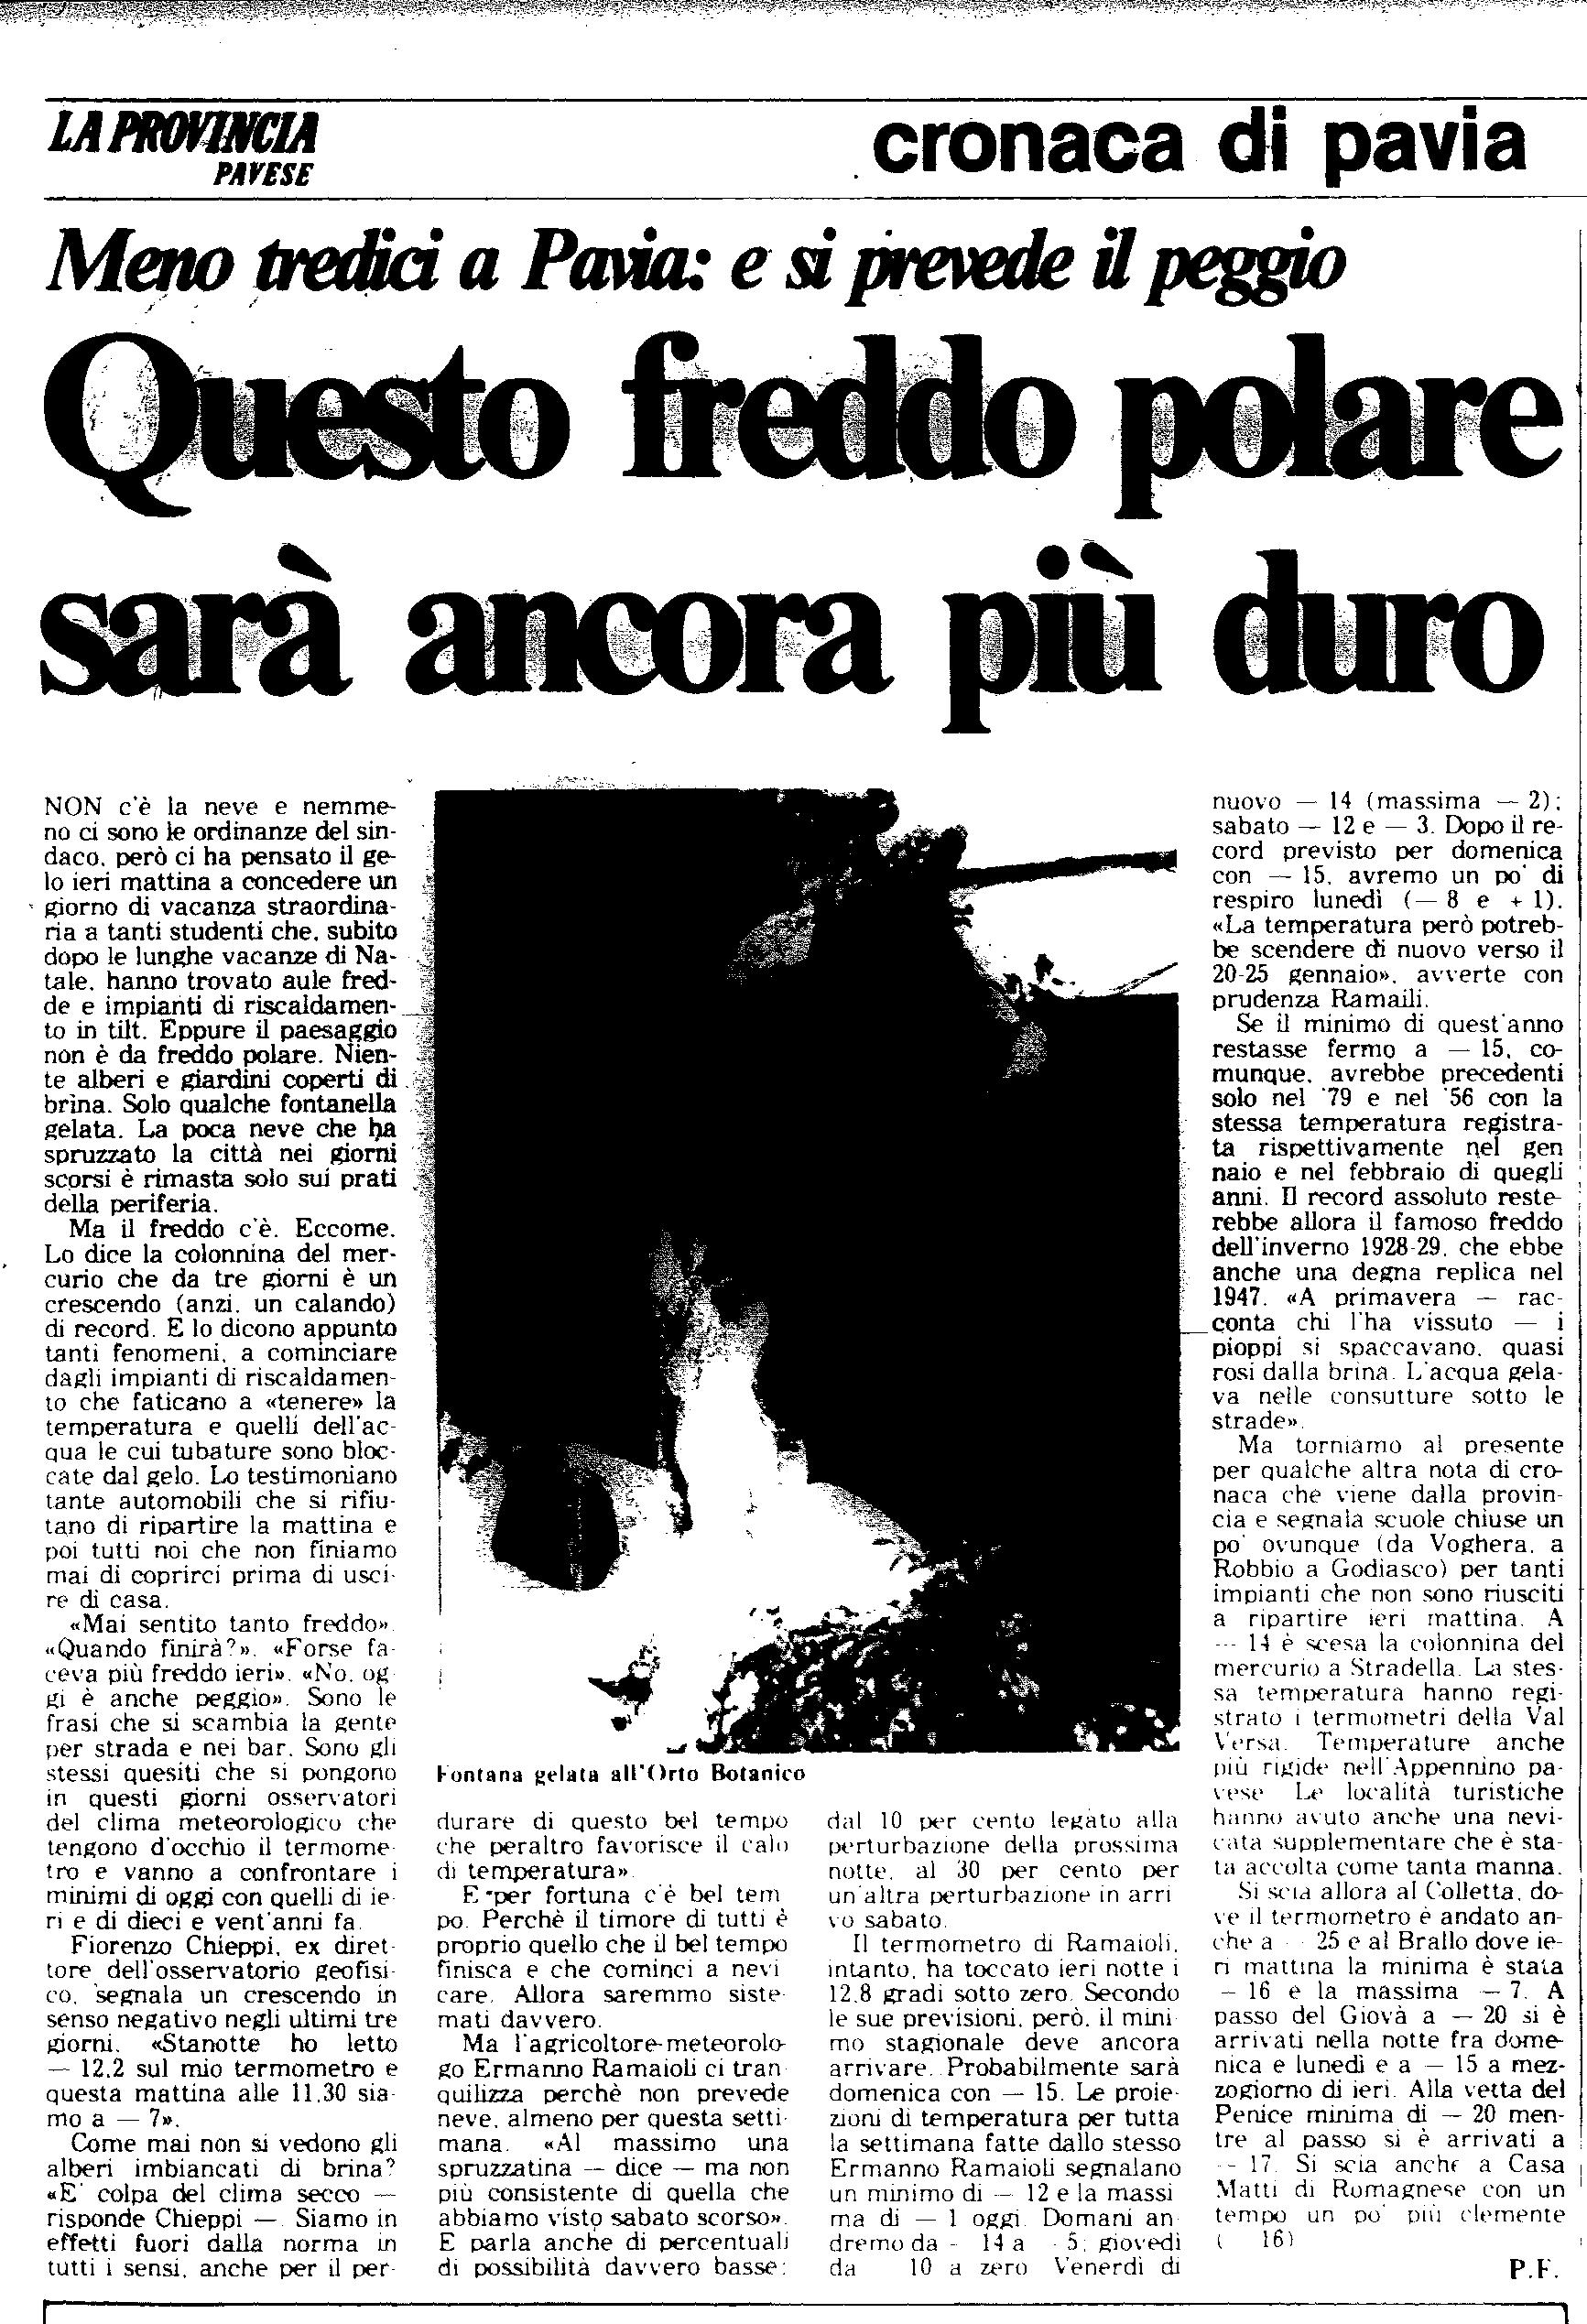 Un altro articolo dell' 8 Gennaio 1985 de